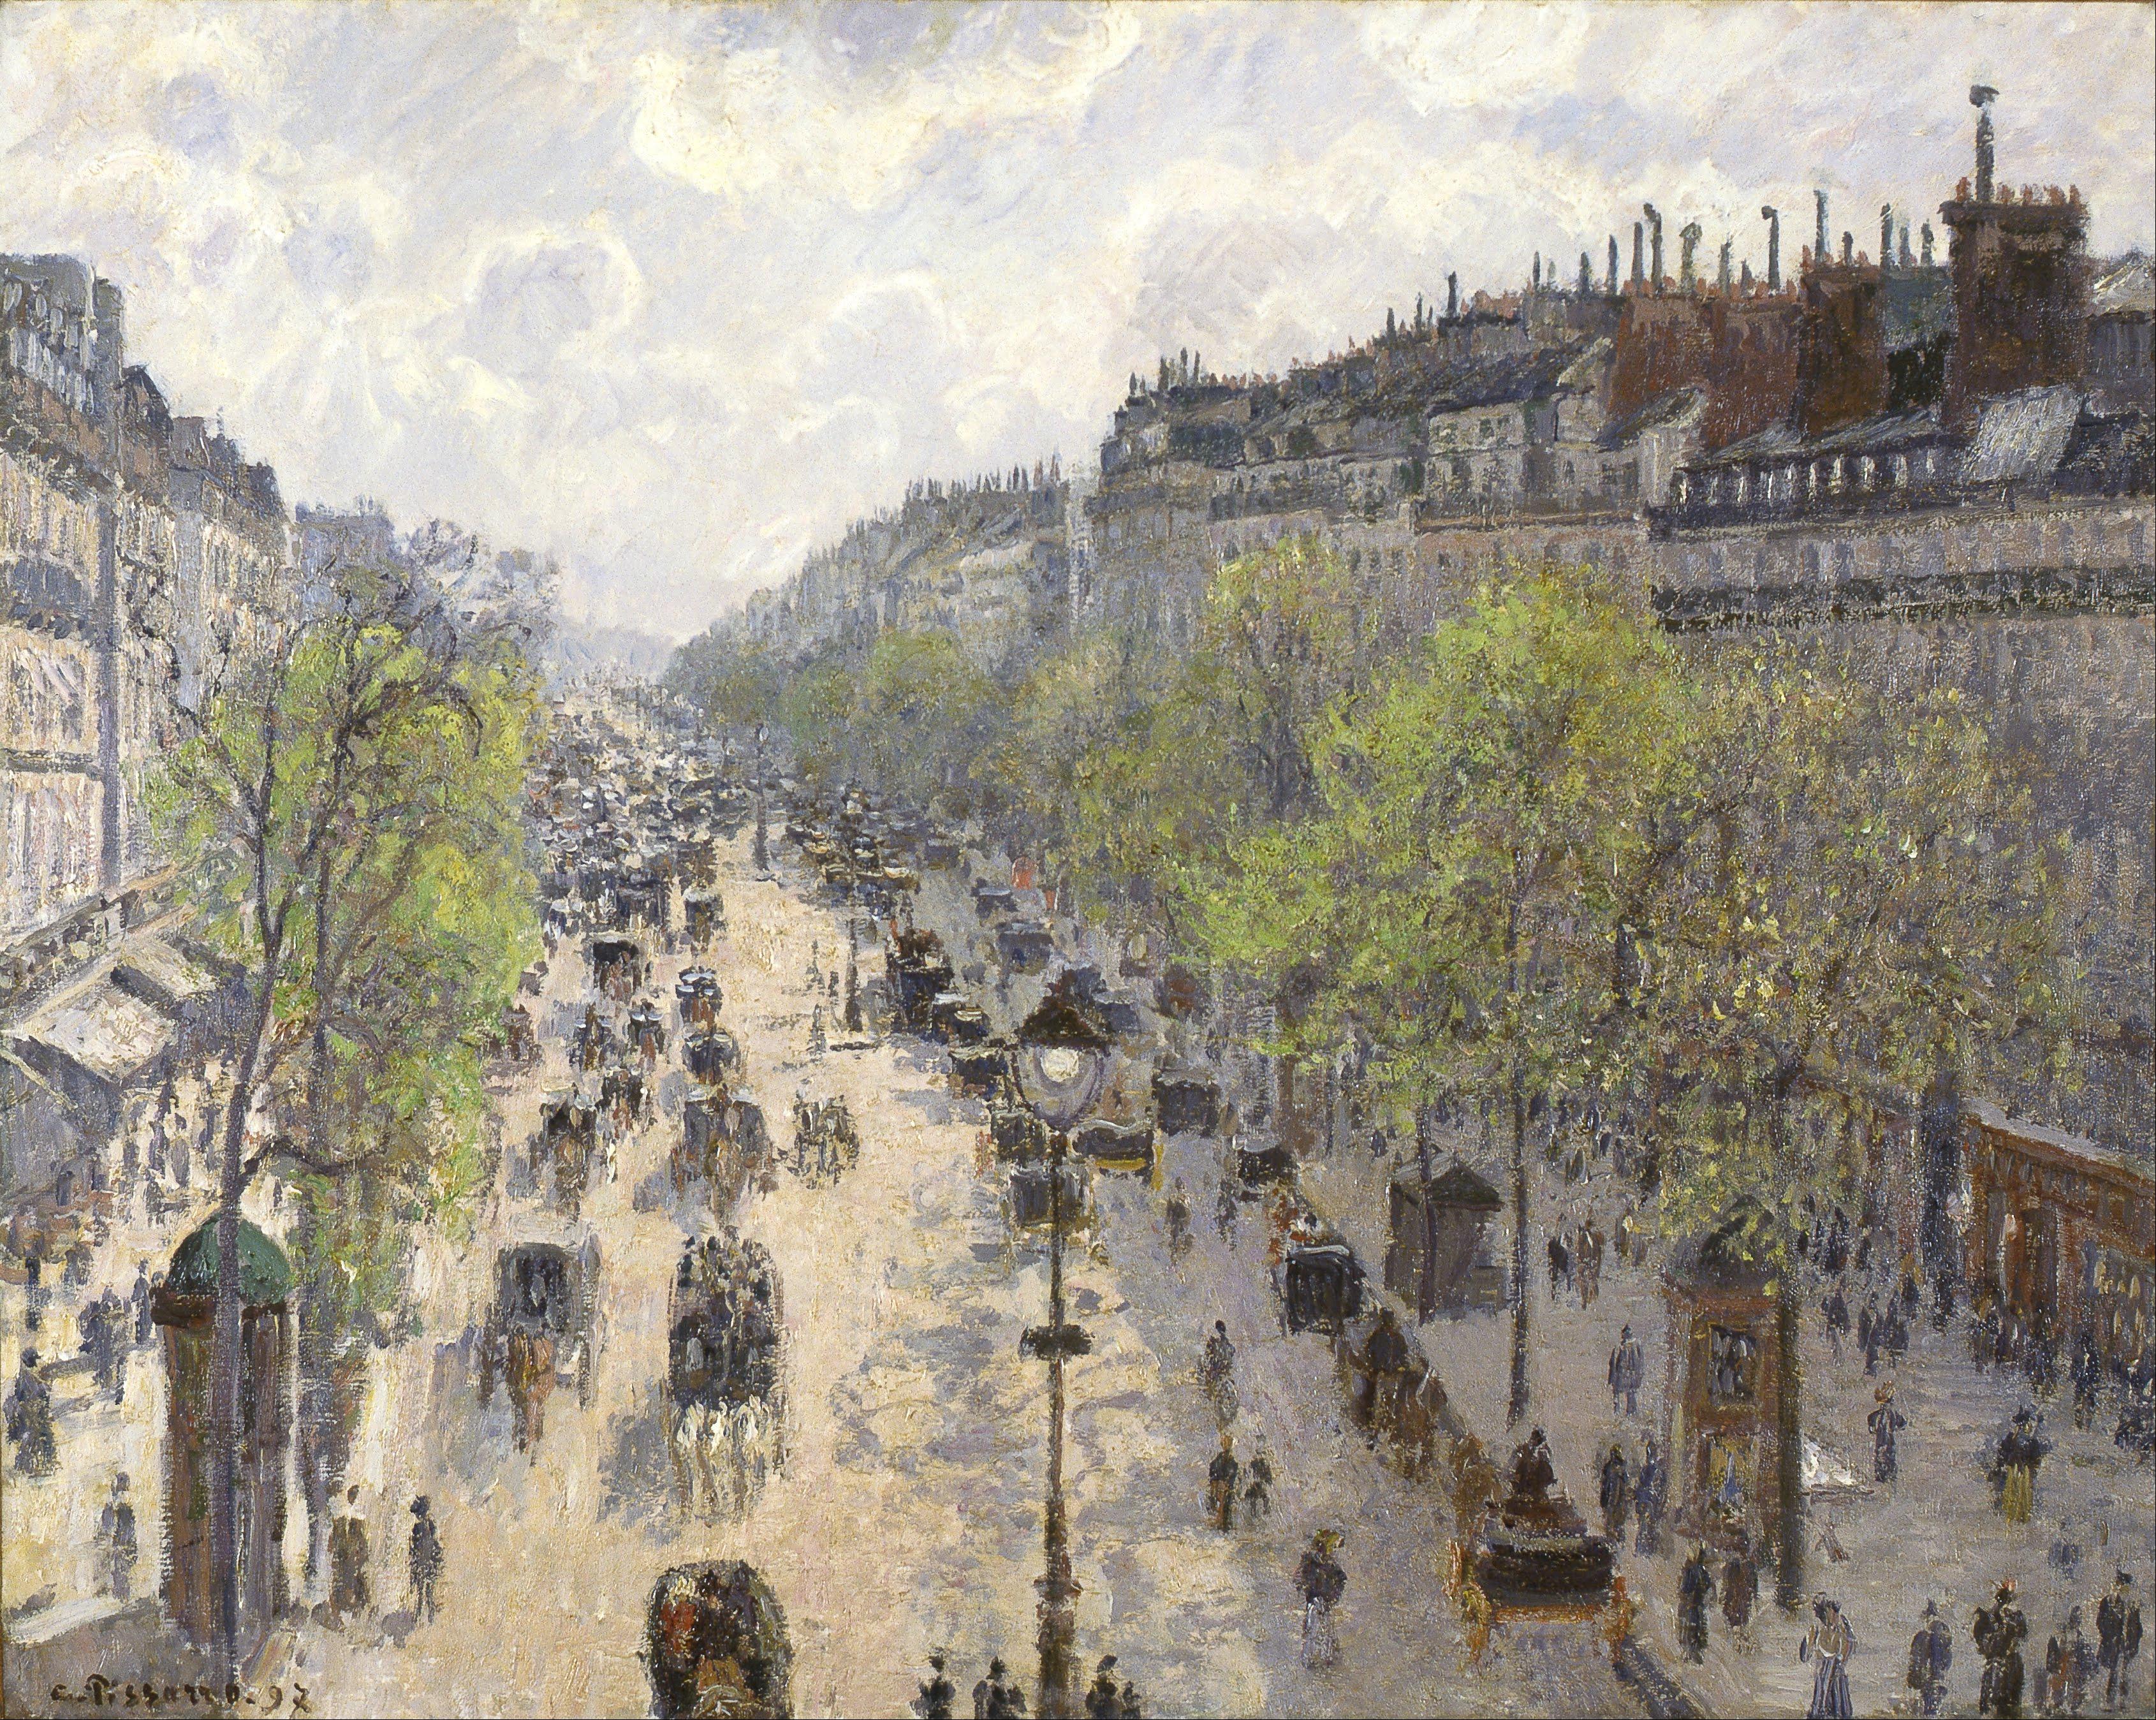 Camille_Pissarro_-_Boulevard_Montmartre,